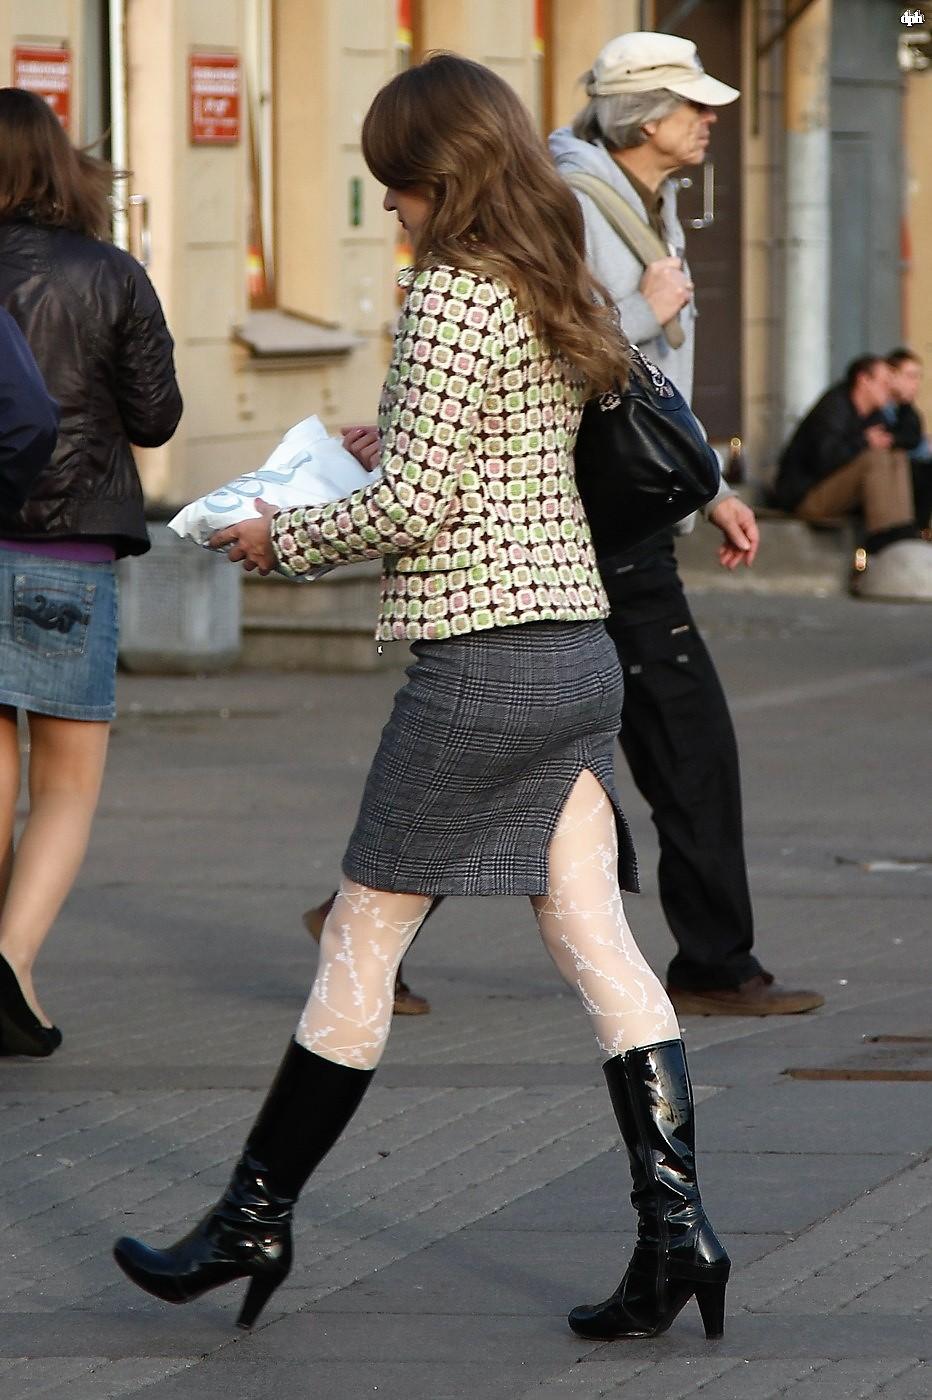 Fashion Tights Skirt Dress Heels-9662